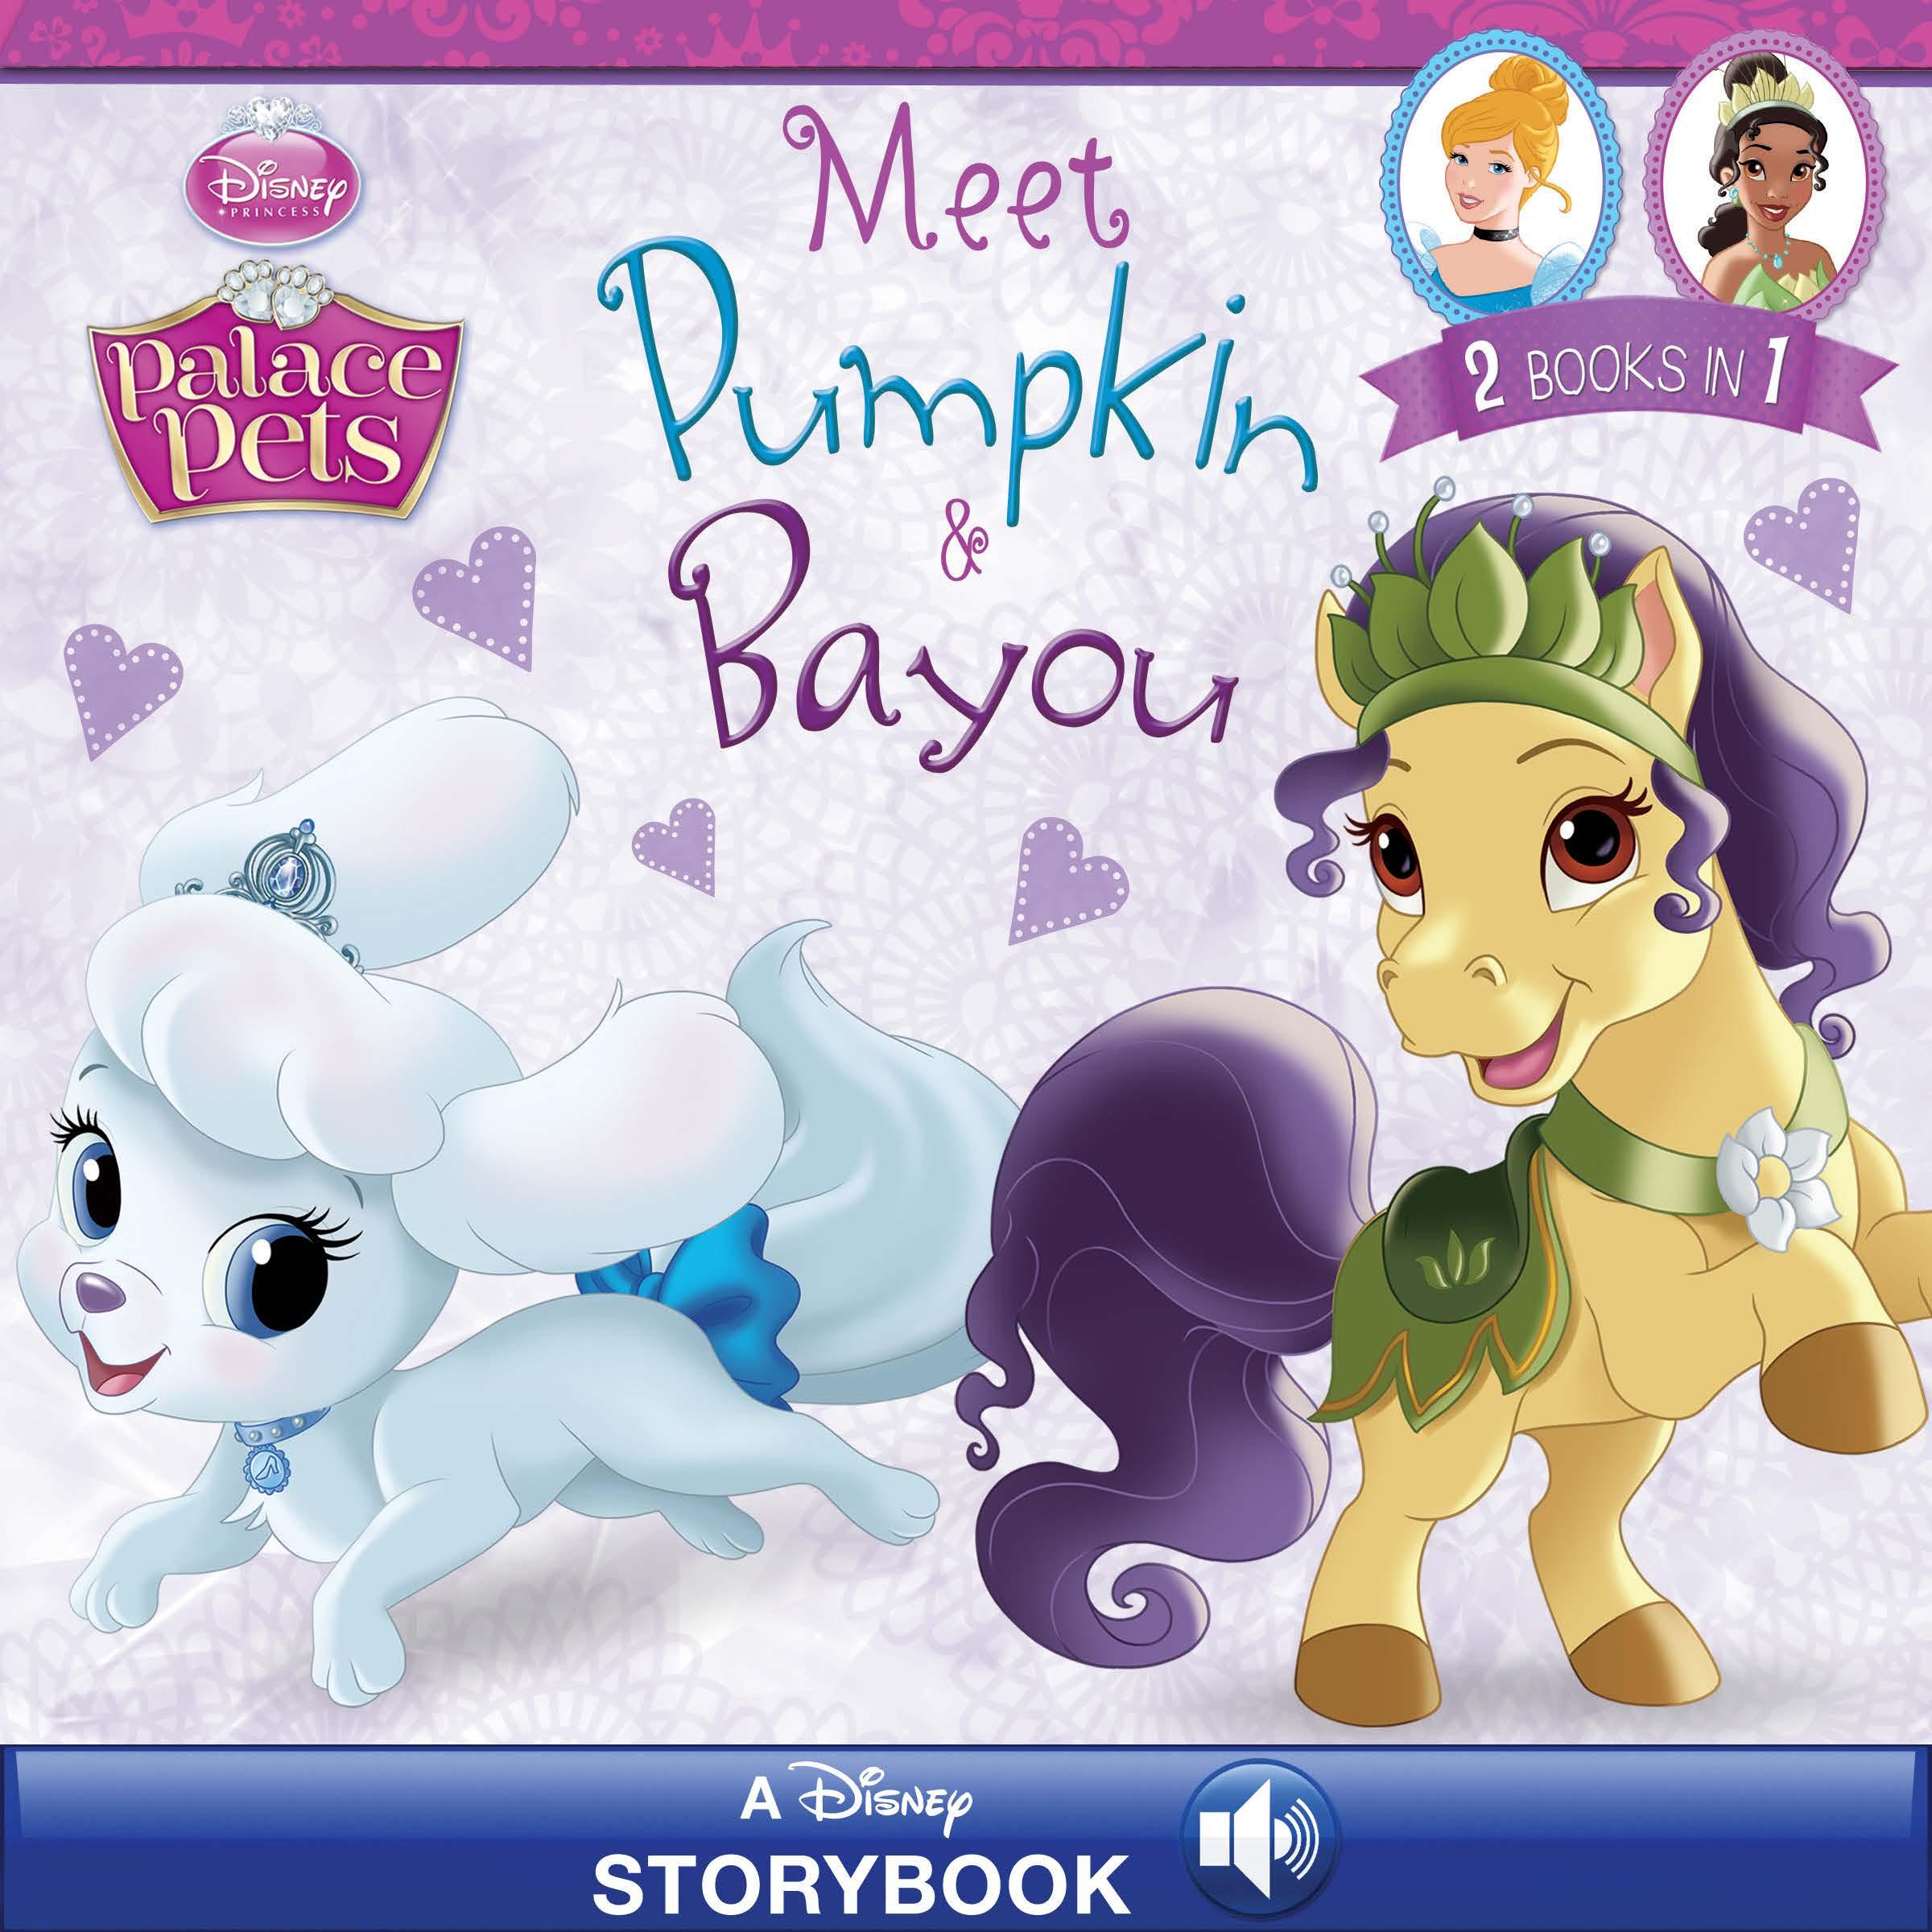 Palace Pets: Meet Pumpkin & Bayou | Disney Books | Disney ...